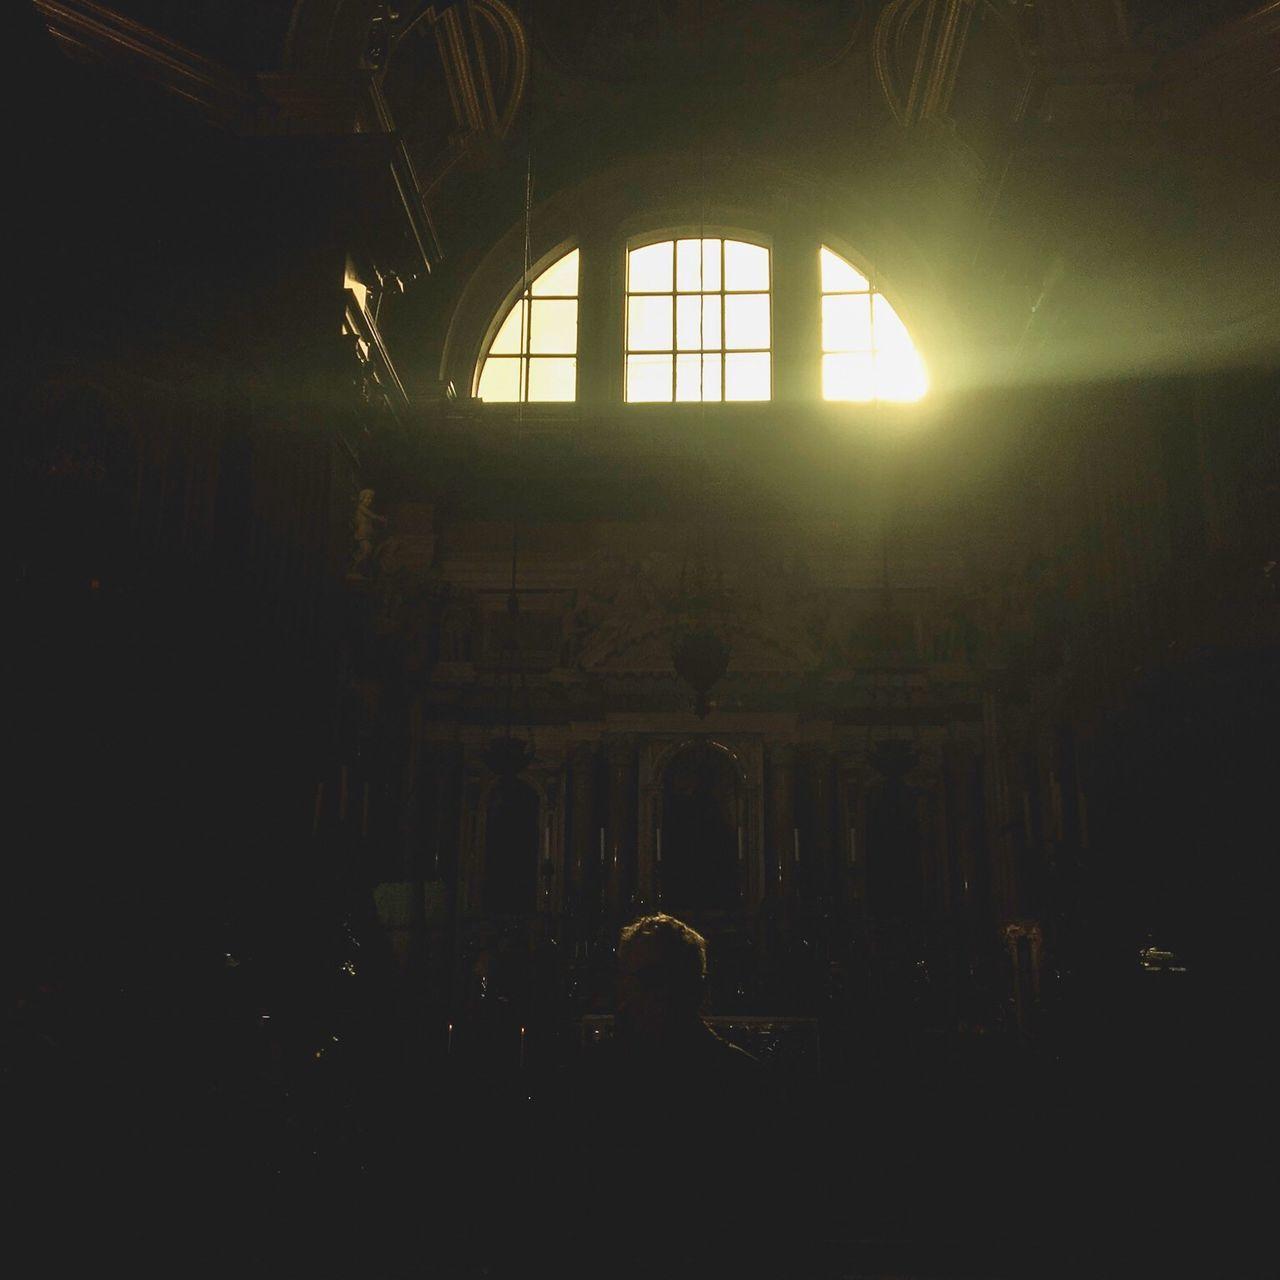 Ligth And Shadow Colors Faith Catedral Duomo Napoli Man David De La Cruz Delacruzfotografia Church